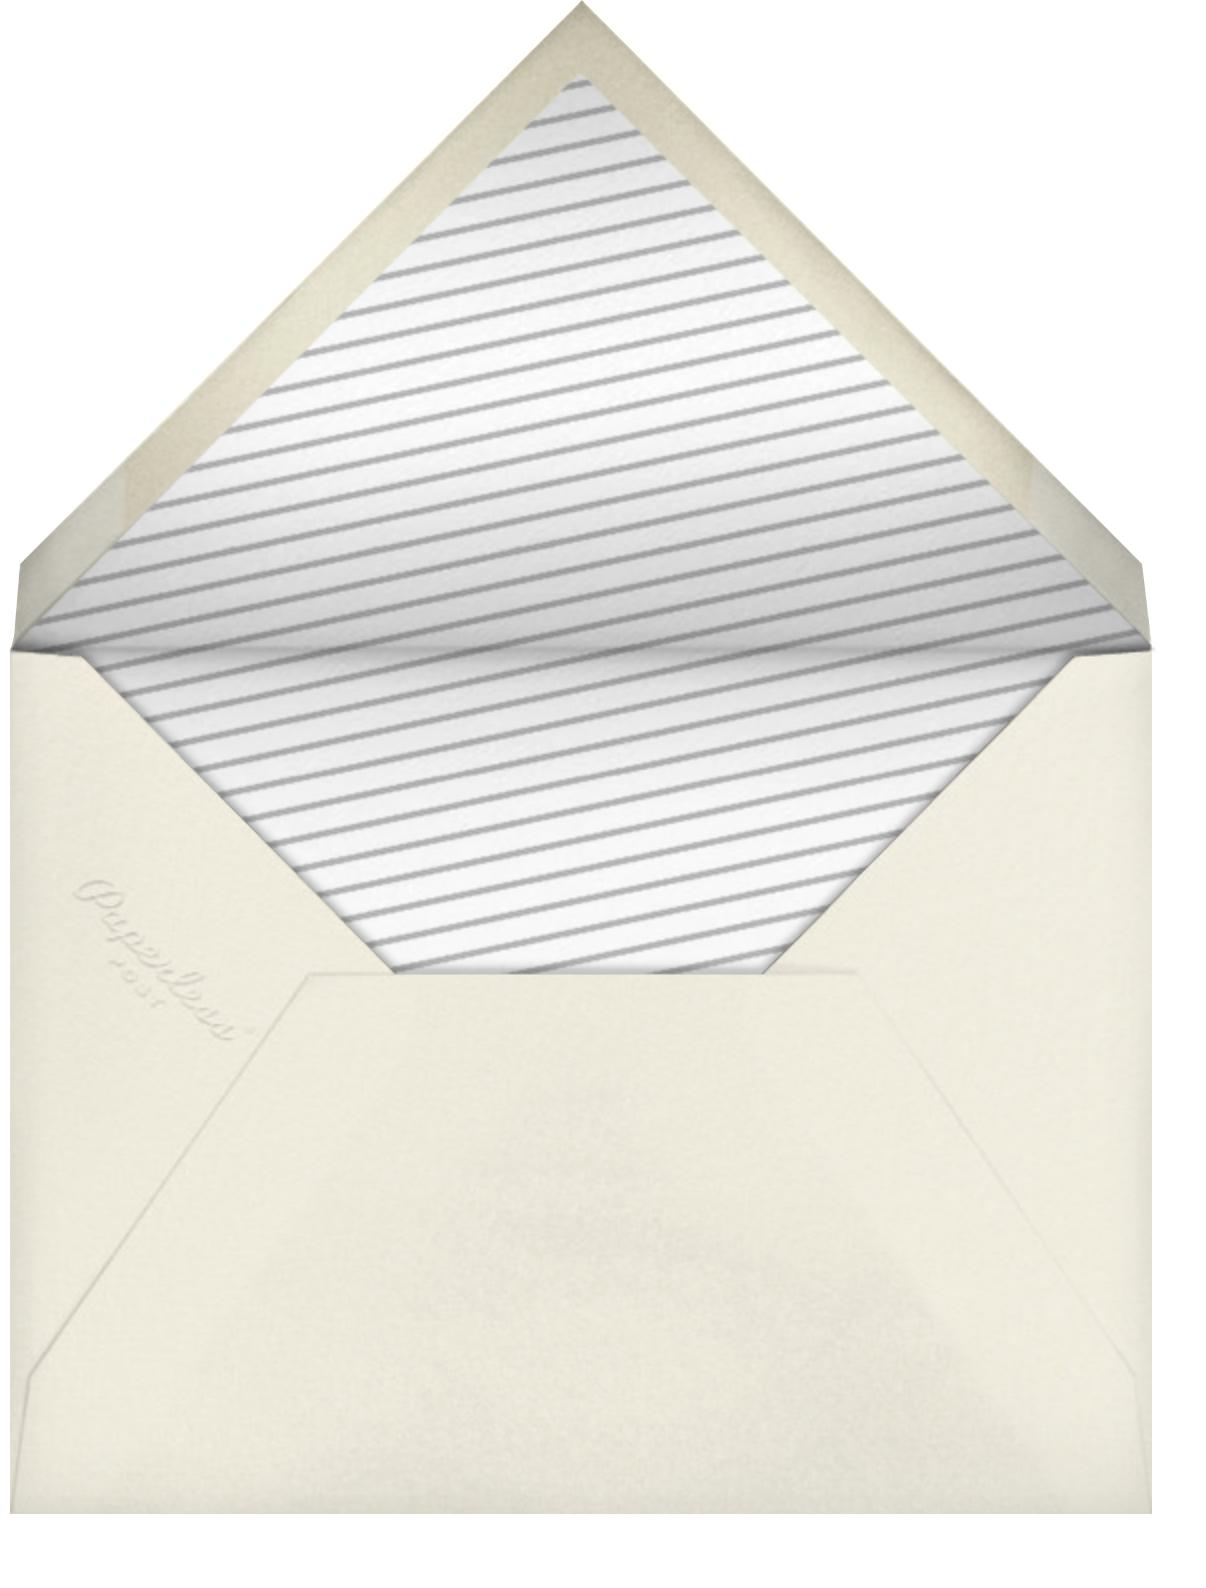 Champagne Bottle - Paperless Post - Adult birthday - envelope back